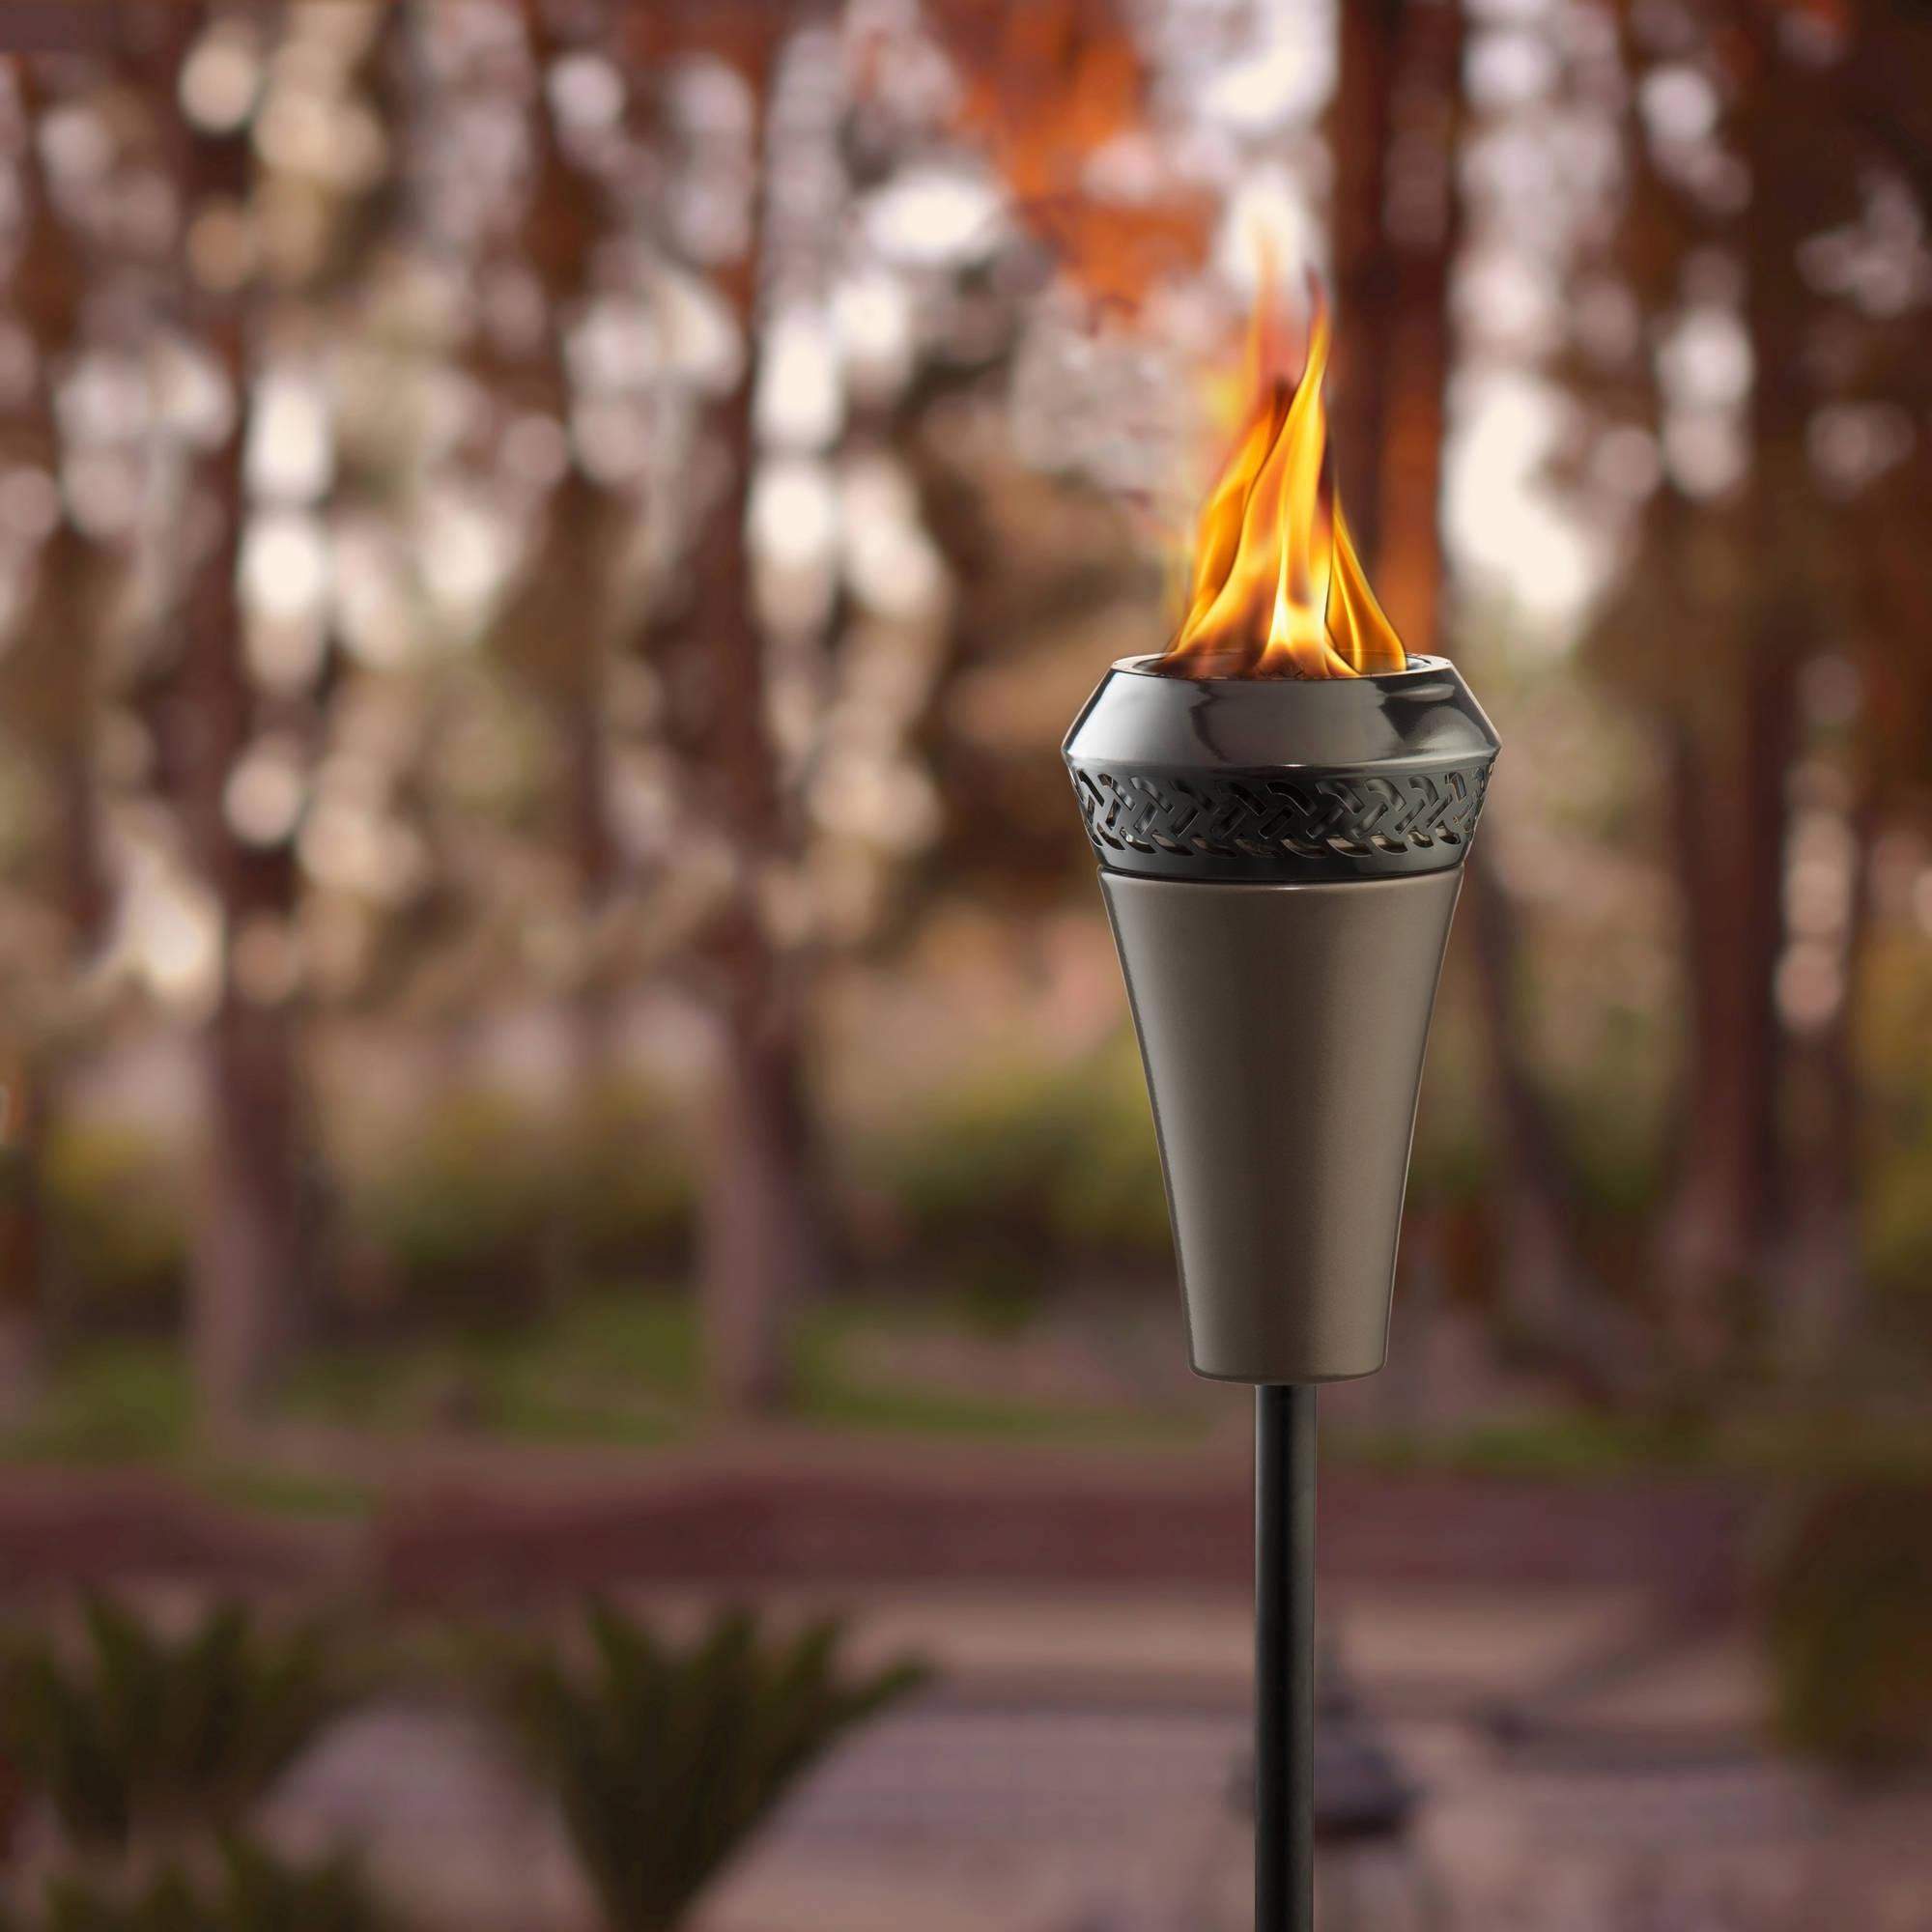 Most Recently Released Outdoor Tiki Lanterns Throughout Tiki Royal Polynesian Torch – Walmart (View 14 of 20)